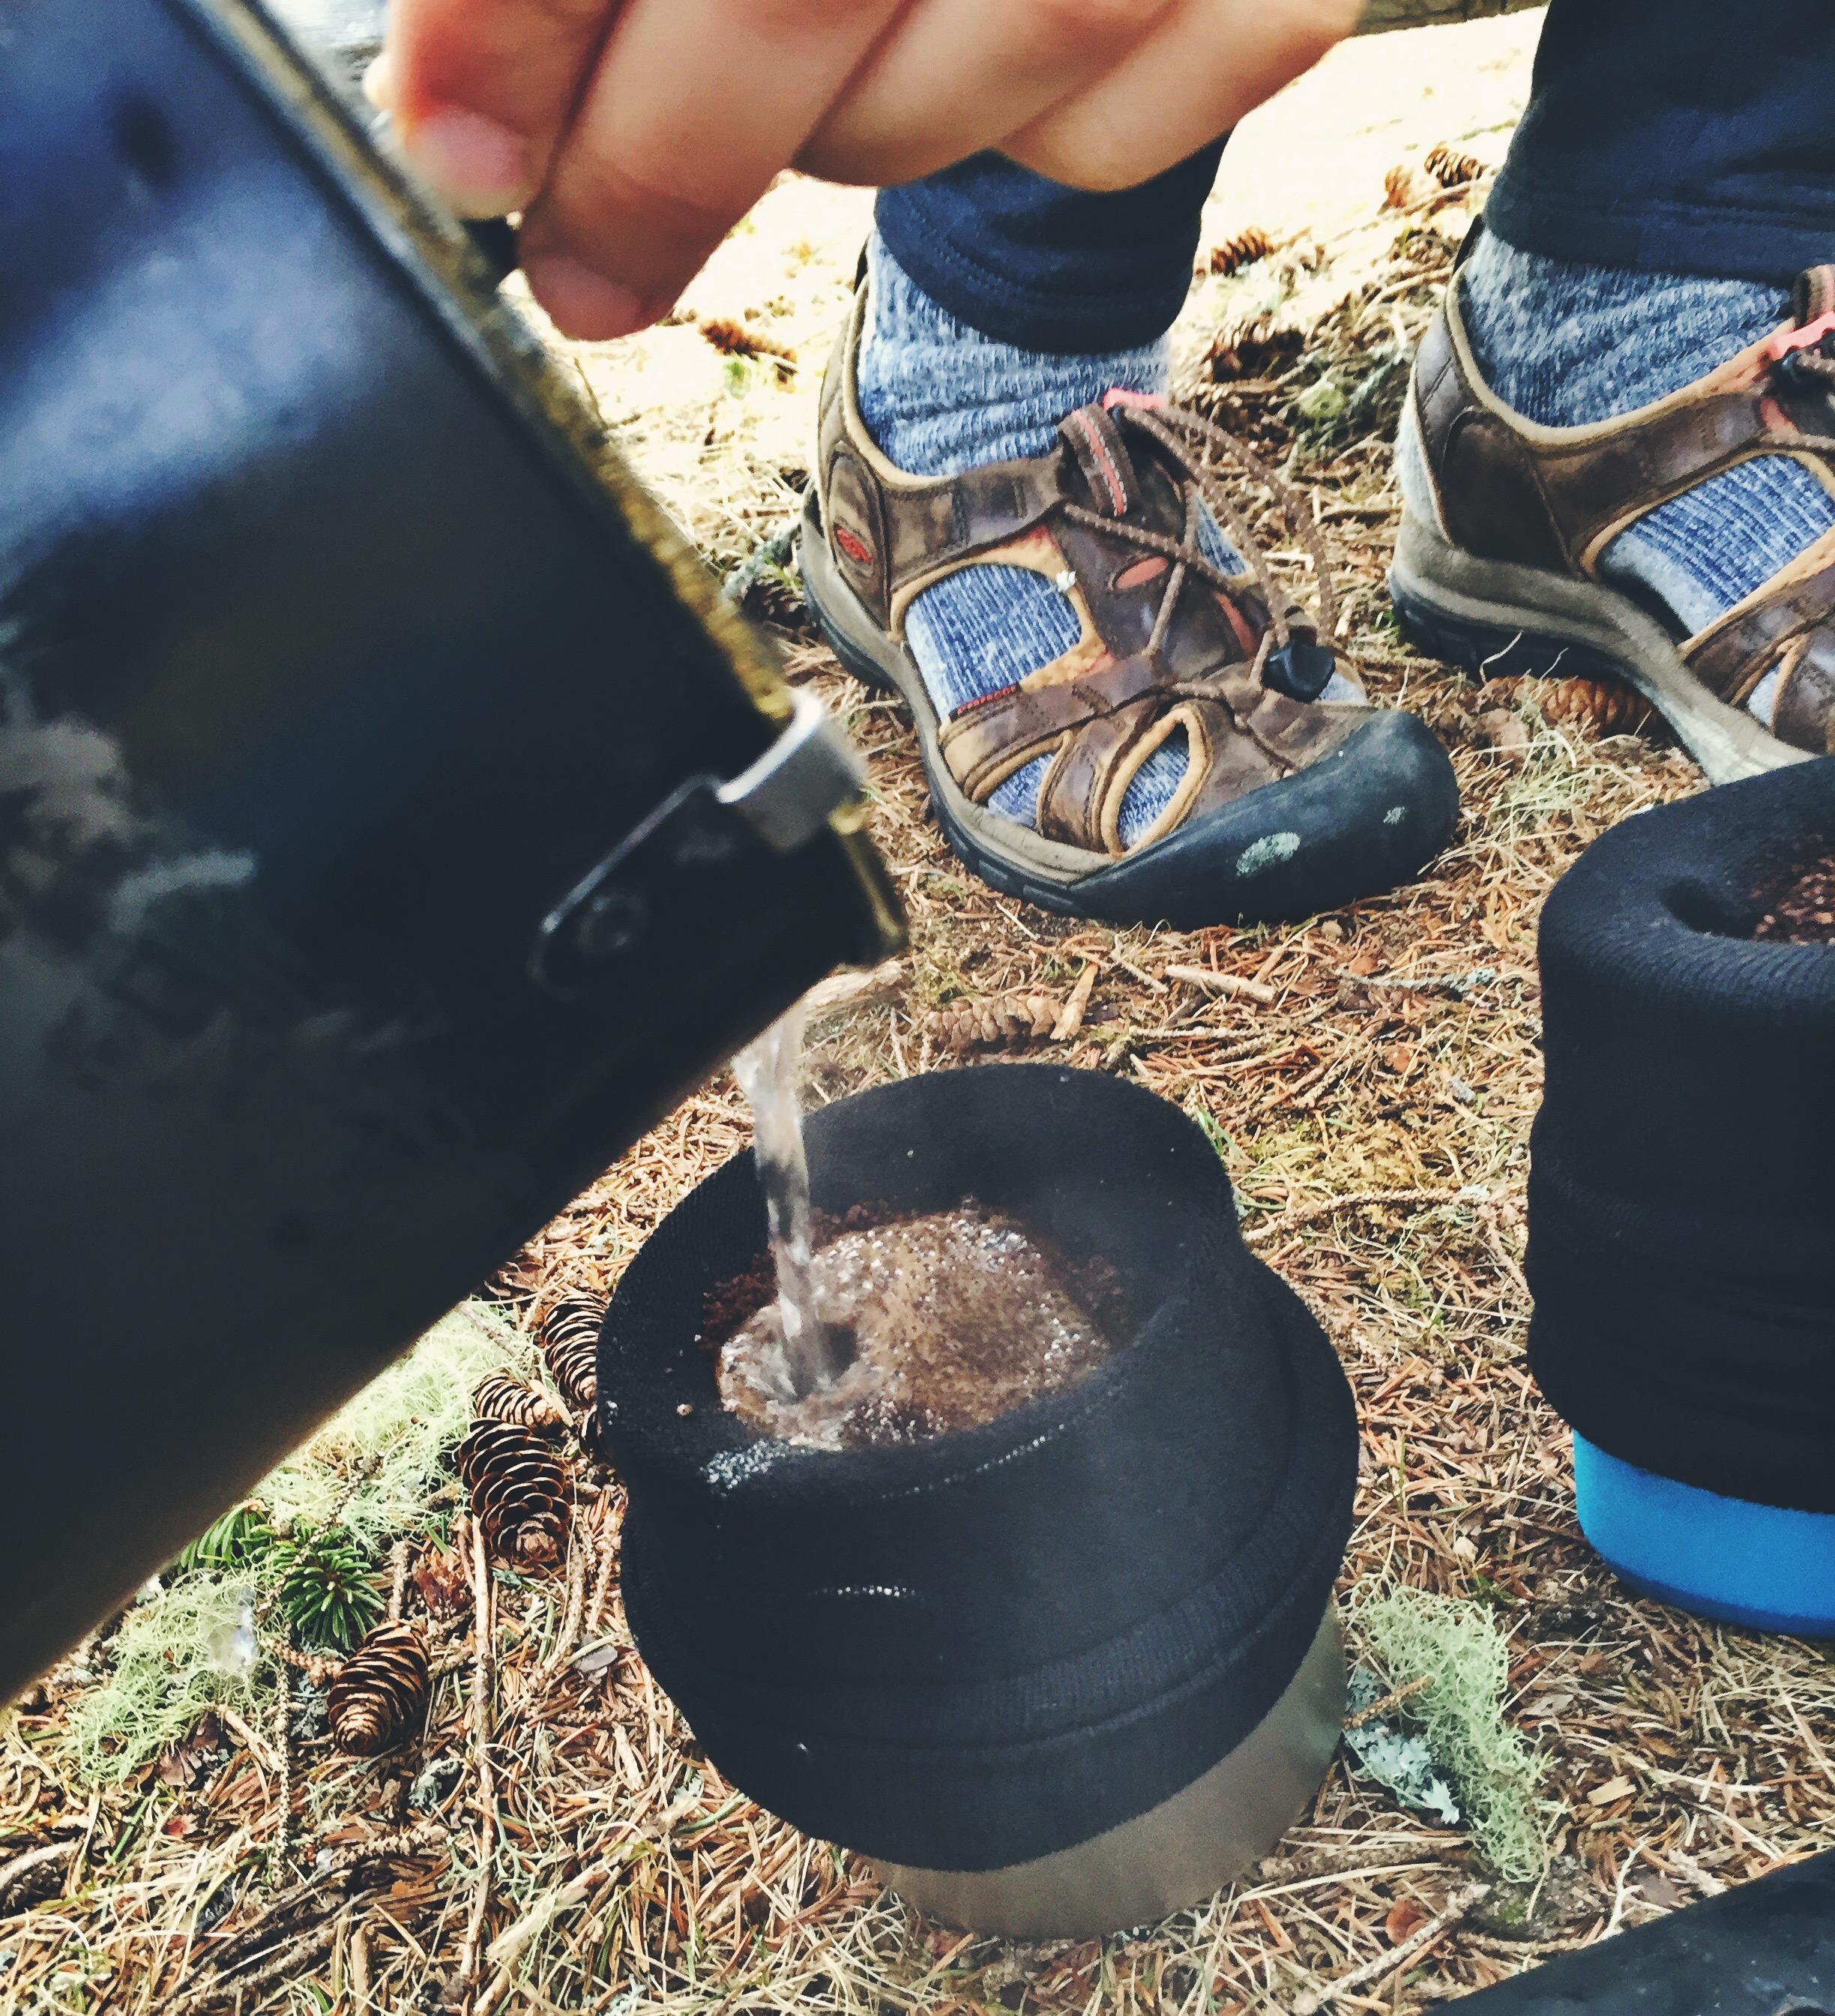 Nothing like improvised sock-coffee